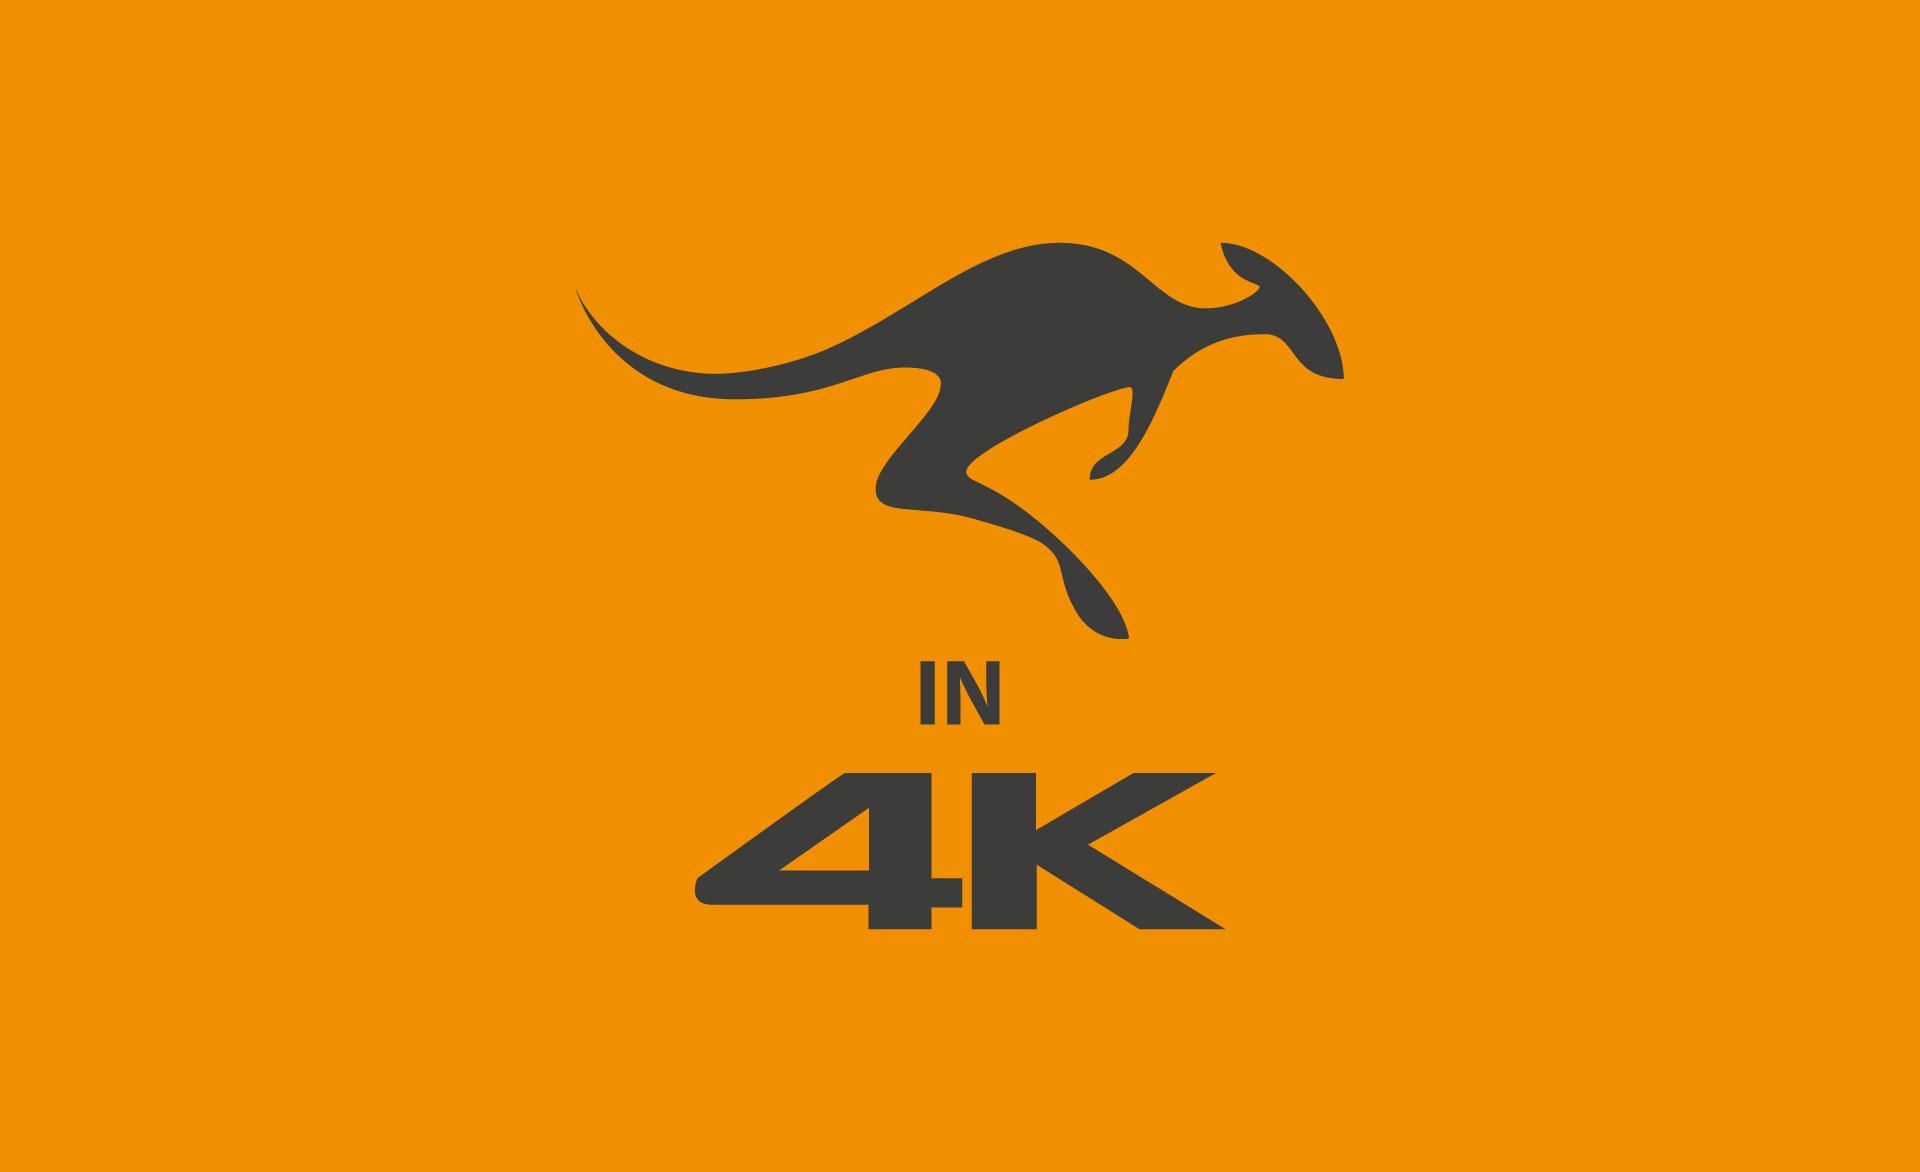 KANGAROO Pictures in 4K!